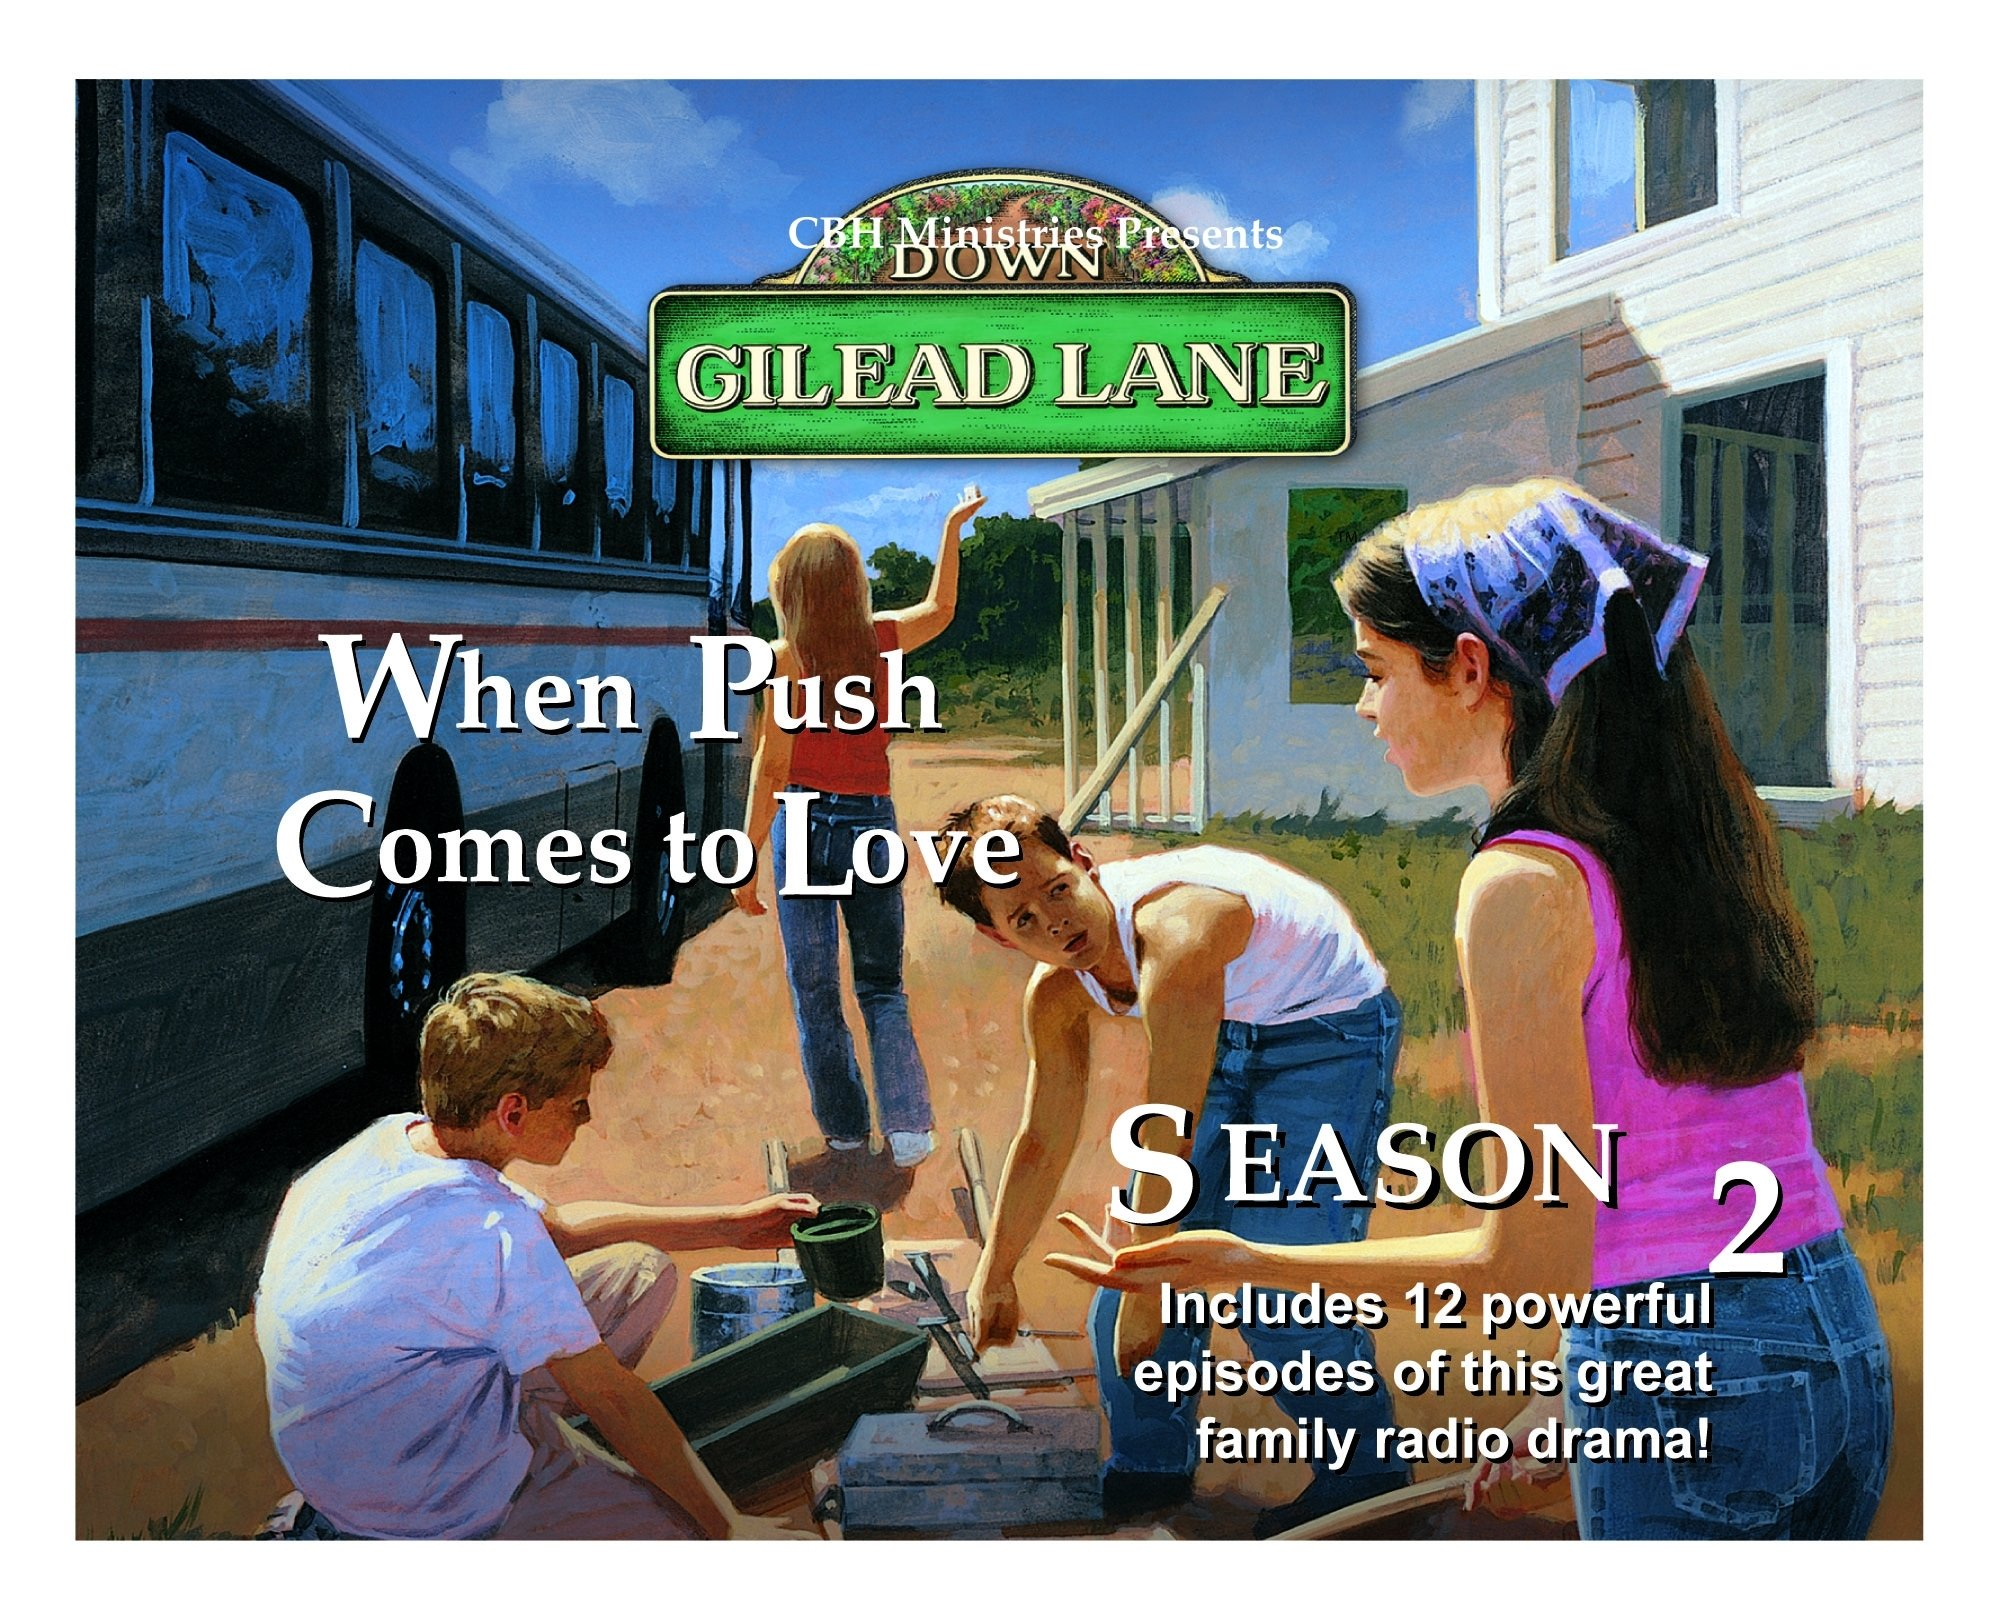 Down Gilead Lane Season 2 (When Push Comes to Love)